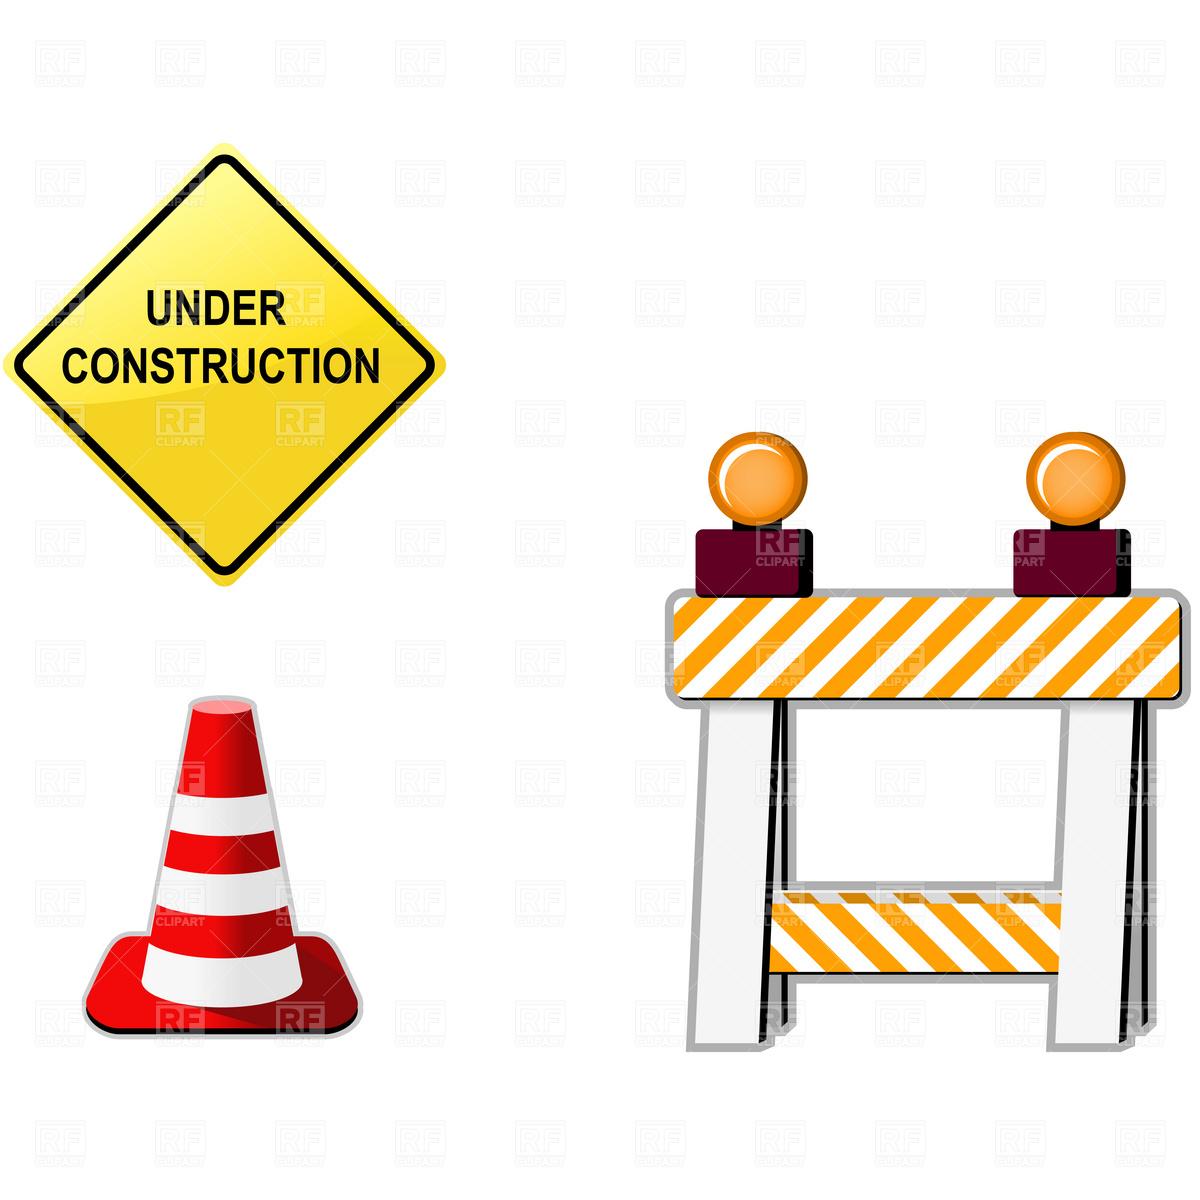 Construction clipart free downloads clip freeuse Under Construction Image | Free download best Under ... clip freeuse